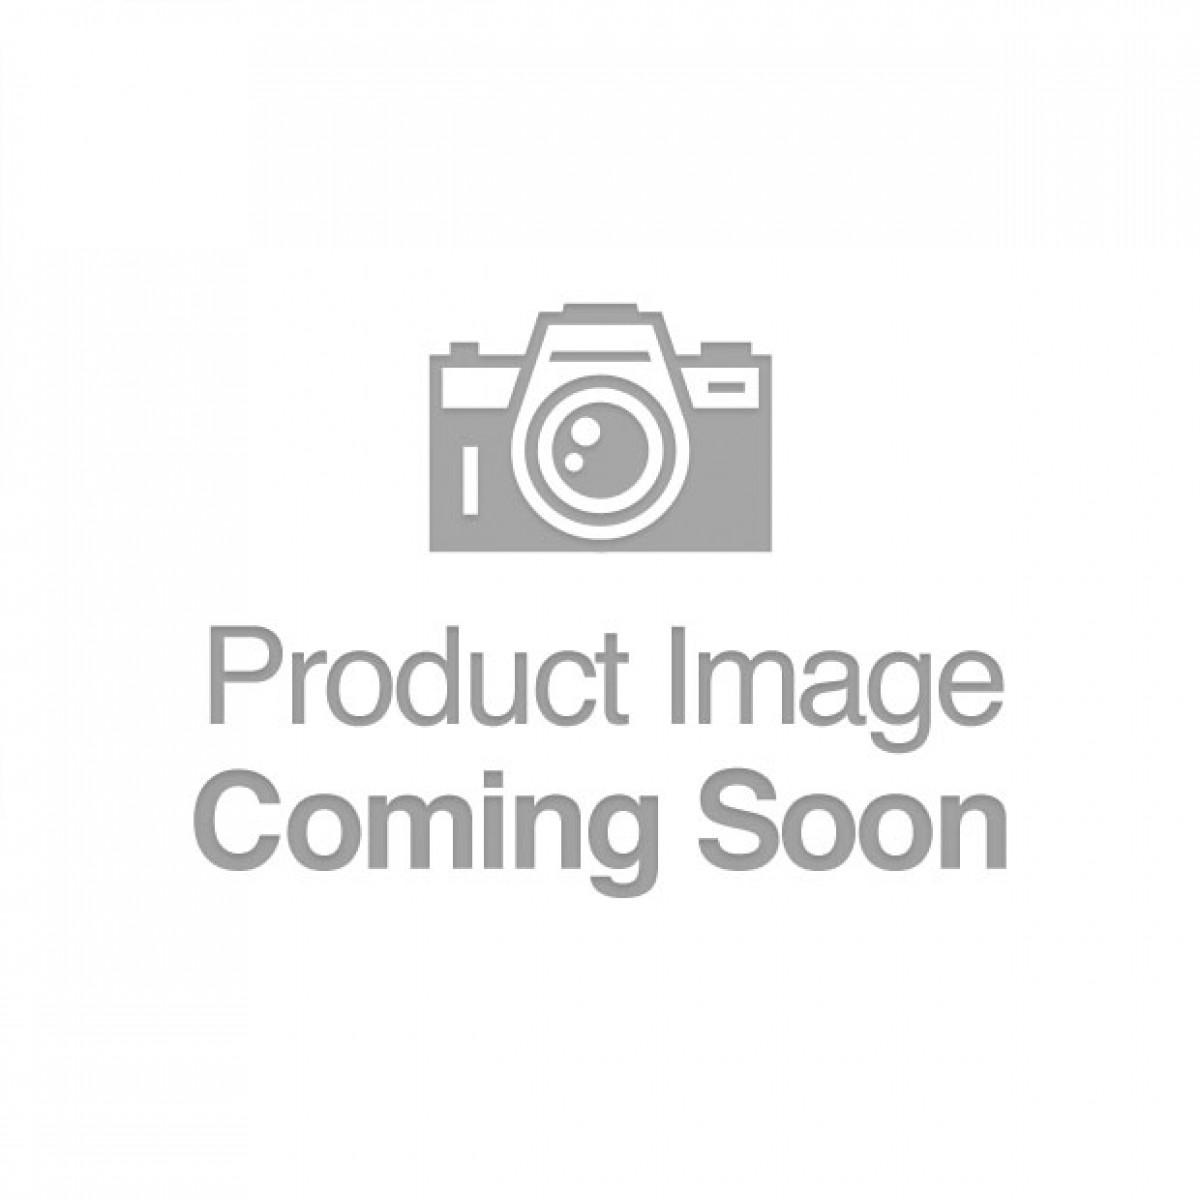 Le Wand Deux Chrome Twin Motor Rechargeable Vibrator - Black